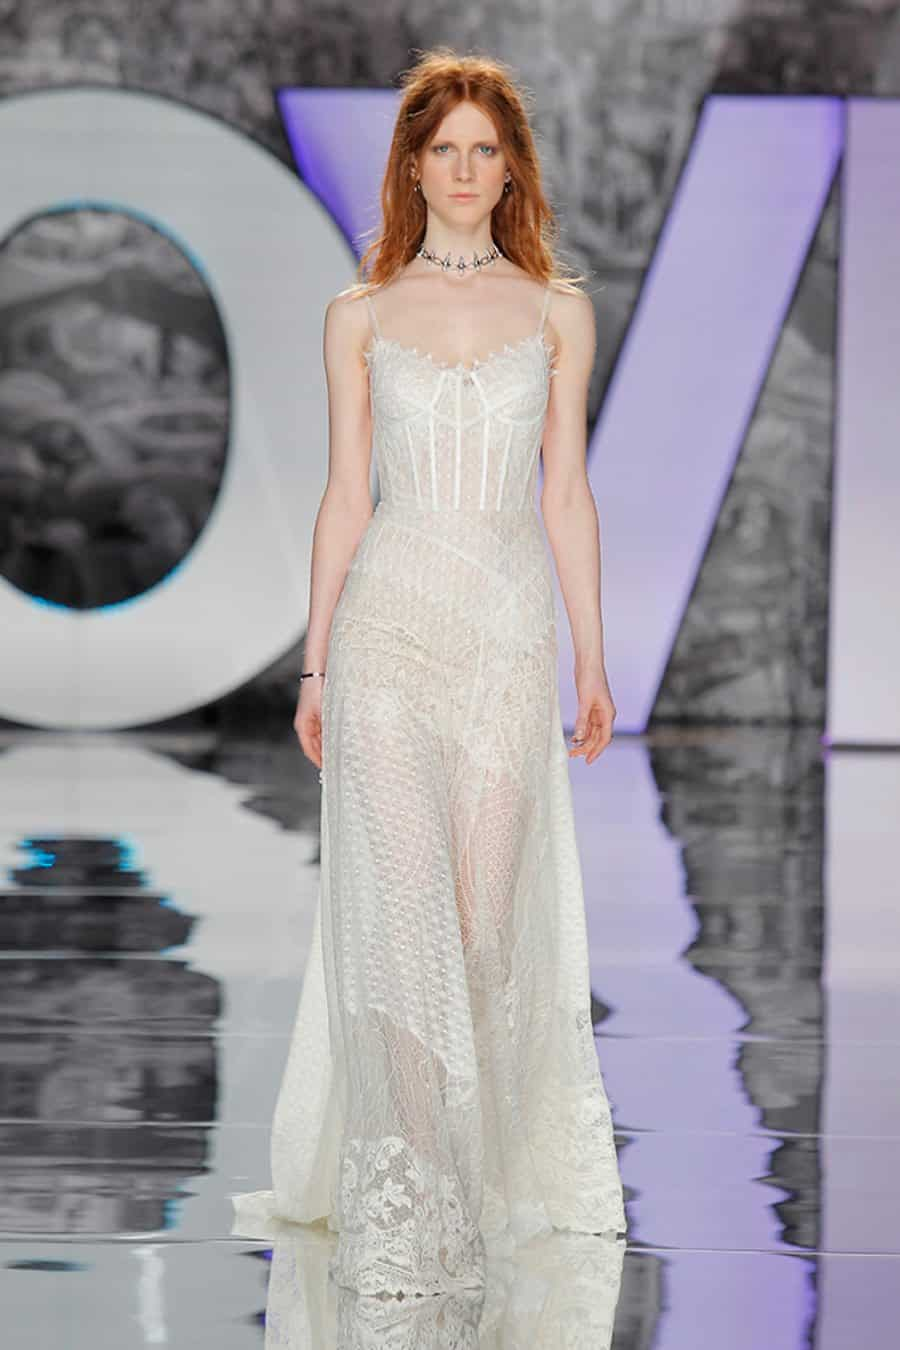 yolancris-weddingdress-bride-boho-chic-folk-wedding-dress-couture-fashion-desing-bohodress-3